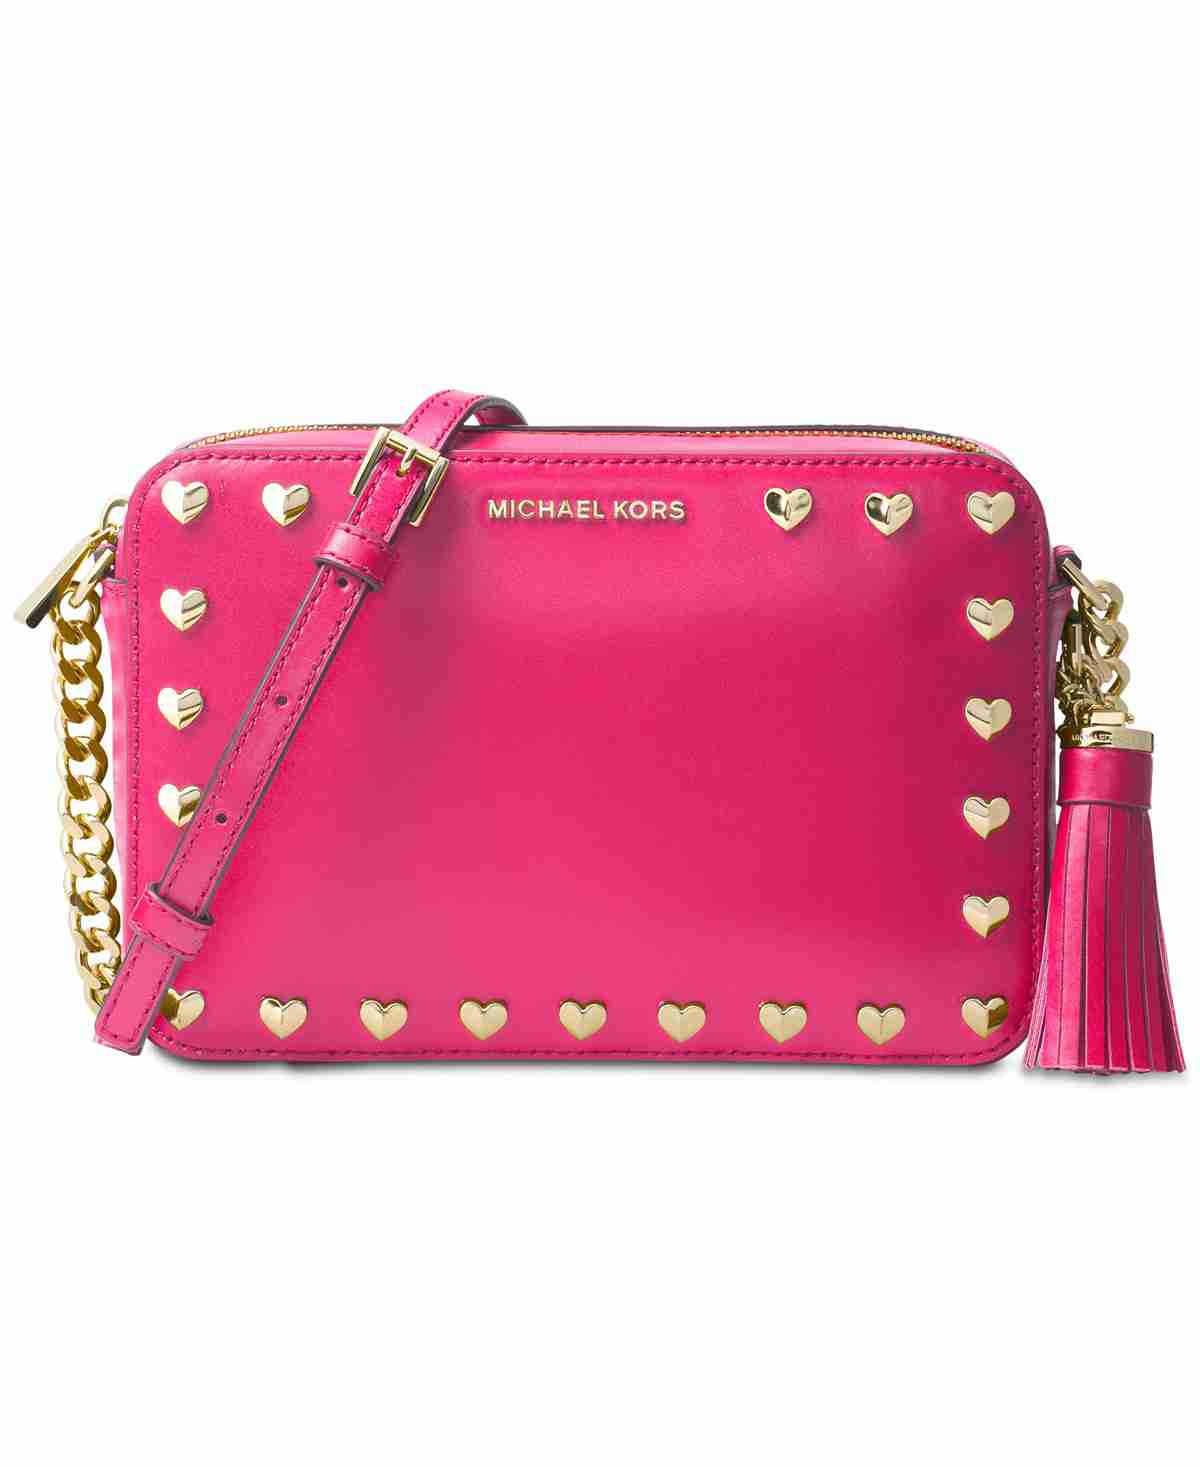 88e085b8c795 ShopandBox - Buy Ginny Medium Camera Bag from US